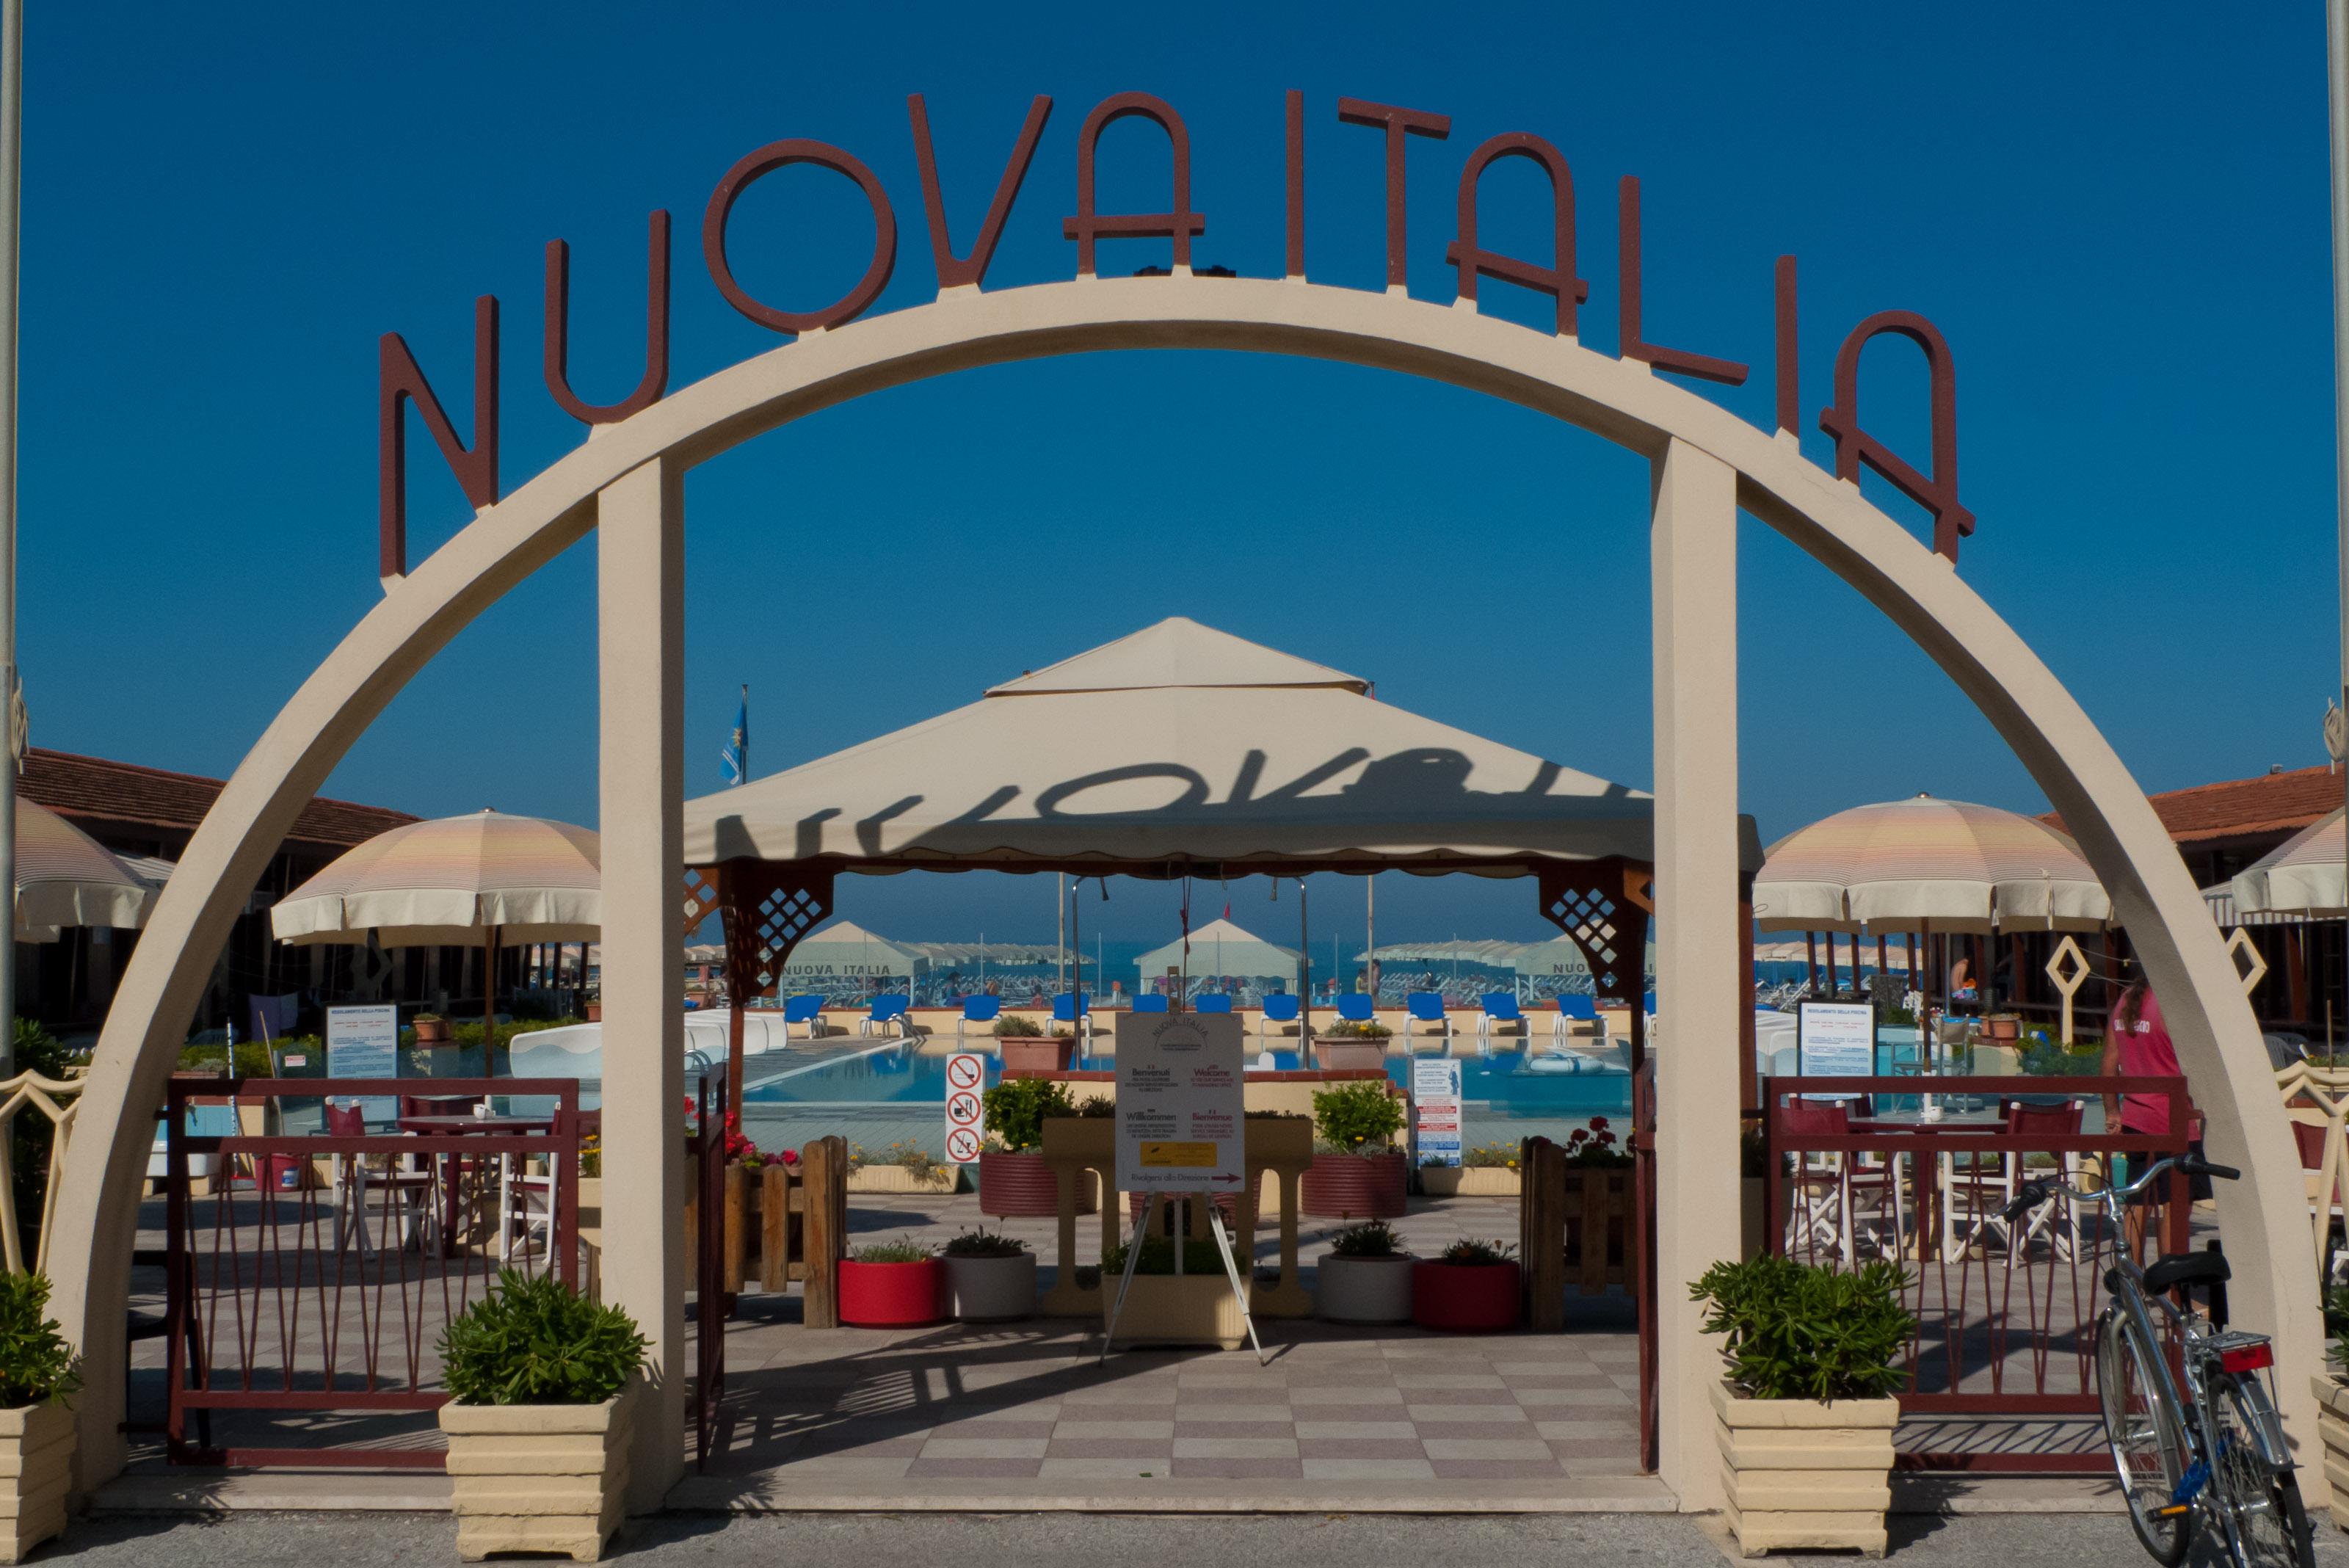 Art Deco Lido entrance - Viareggio (Toscana)